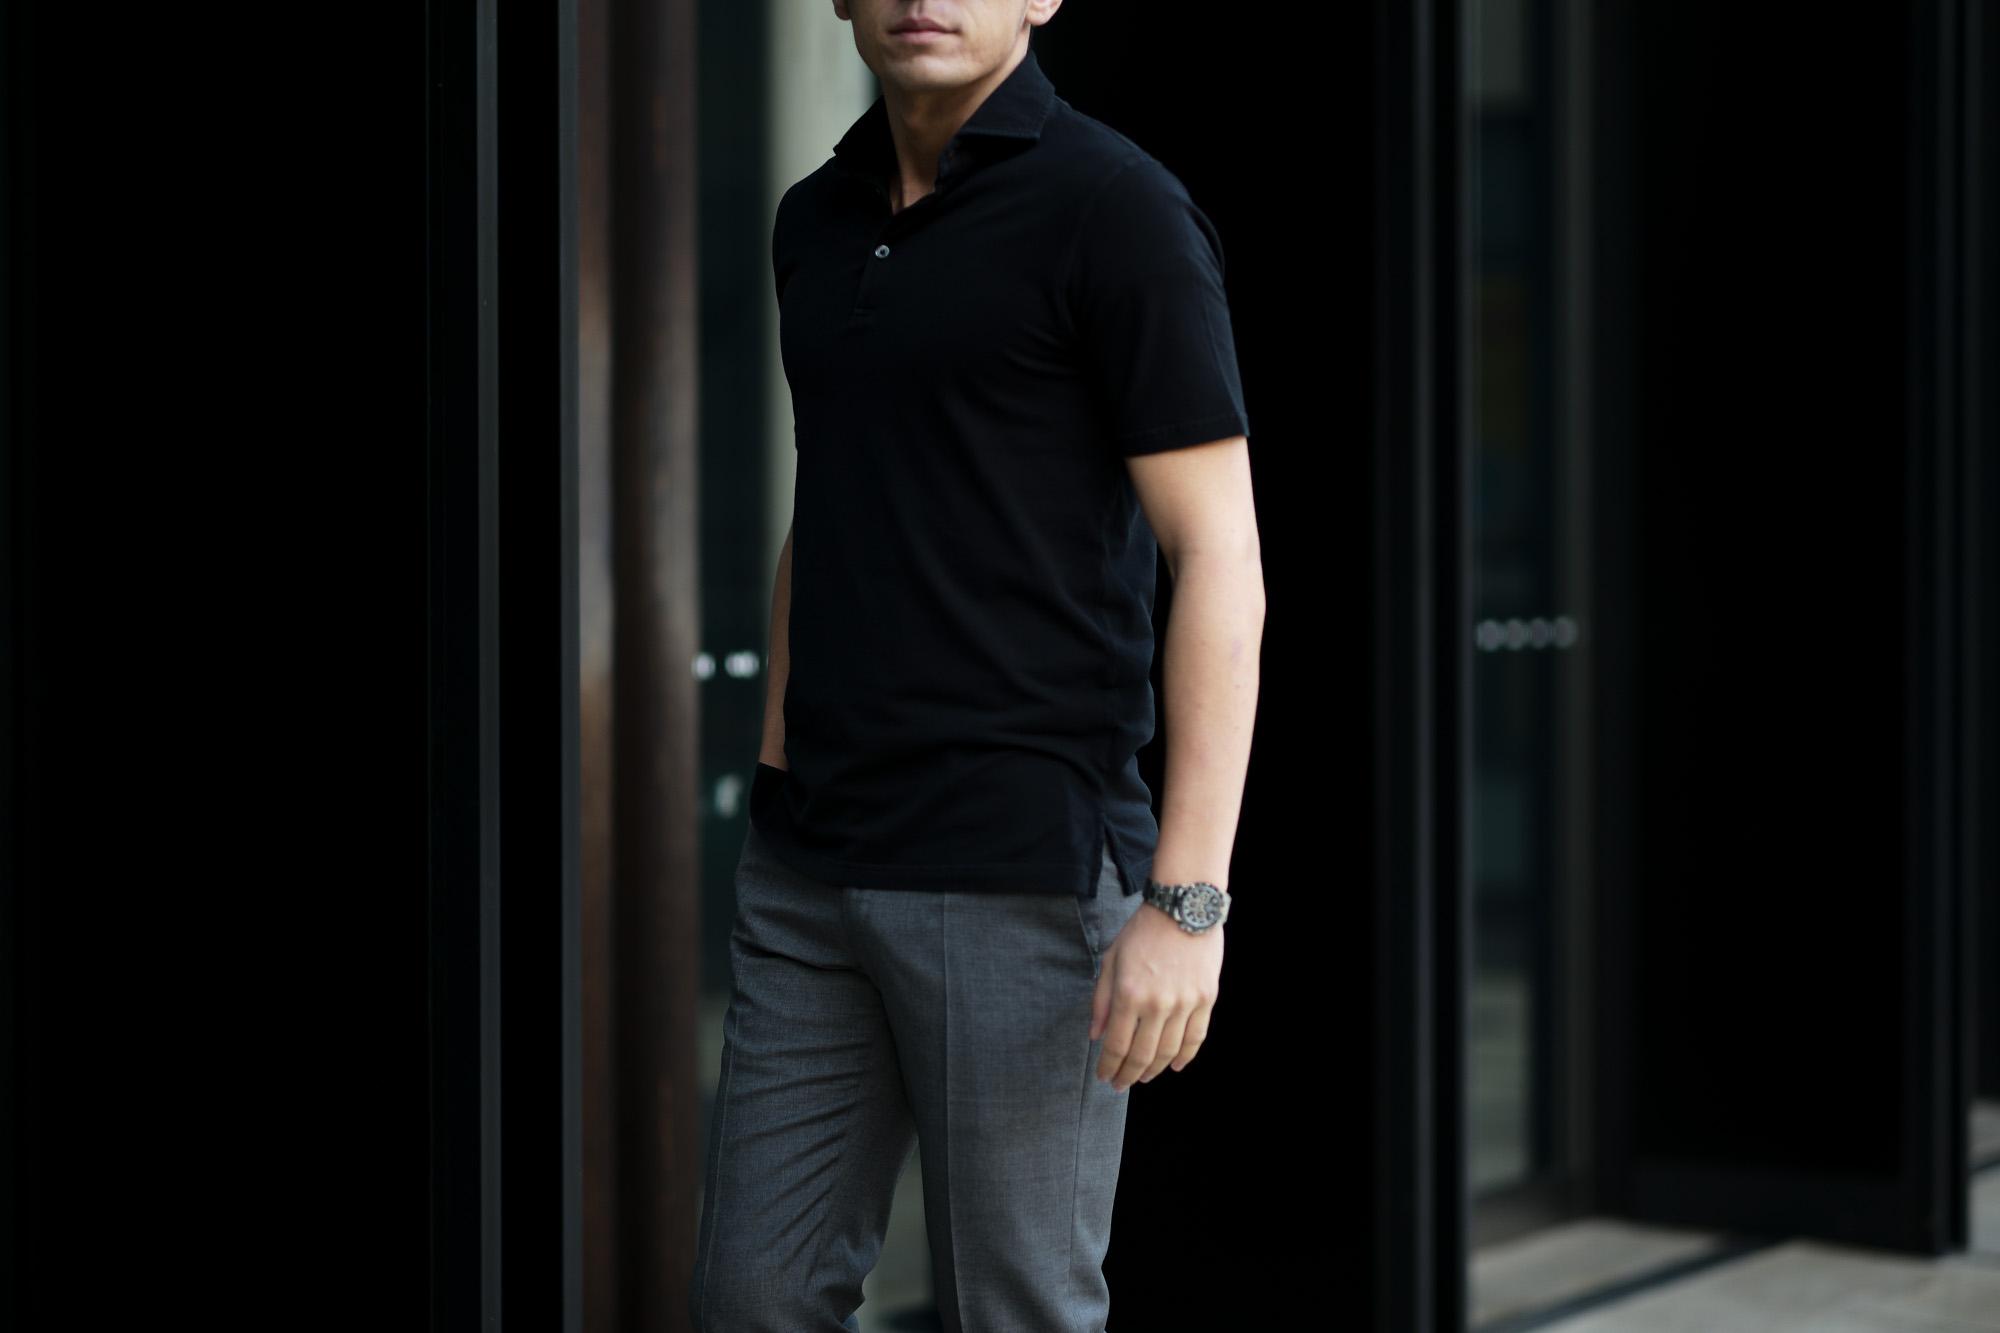 FEDELI(フェデーリ) Piquet Polo Shirt (ピケ ポロシャツ) カノコ ポロシャツ BLACK (ブラック・36) made in italy (イタリア製)2020 春夏新作 愛知 名古屋 altoediritto アルトエデリット ポロ